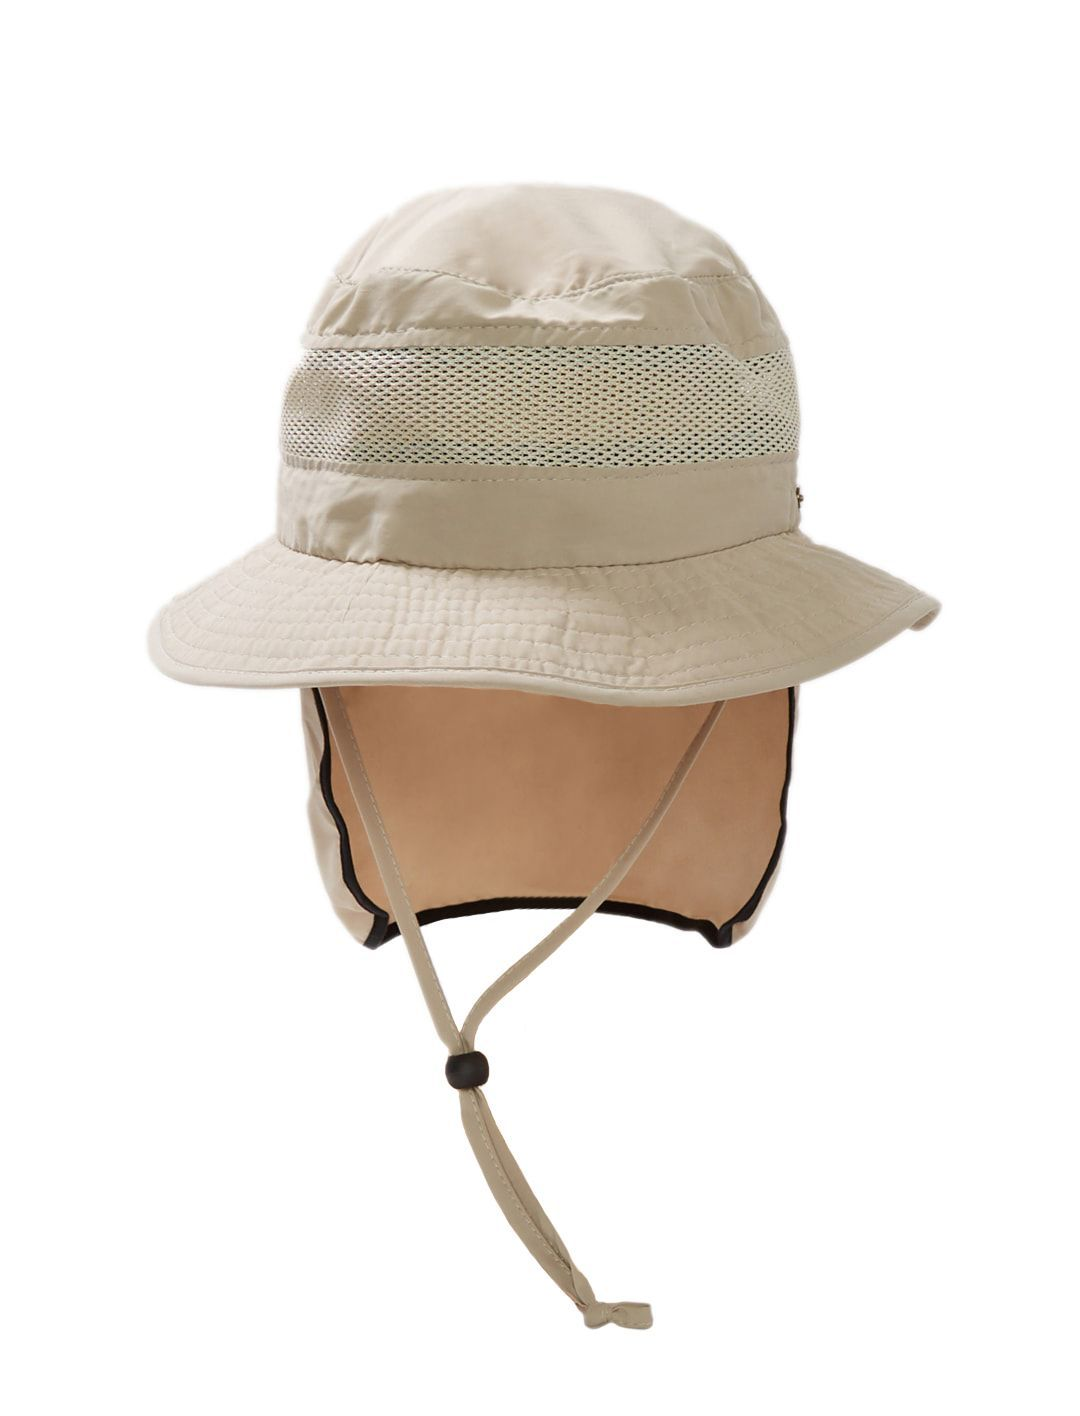 0f7e1bce04b Stetson Men s No Fly Zone Mesh Bucket Hat STC199. Details